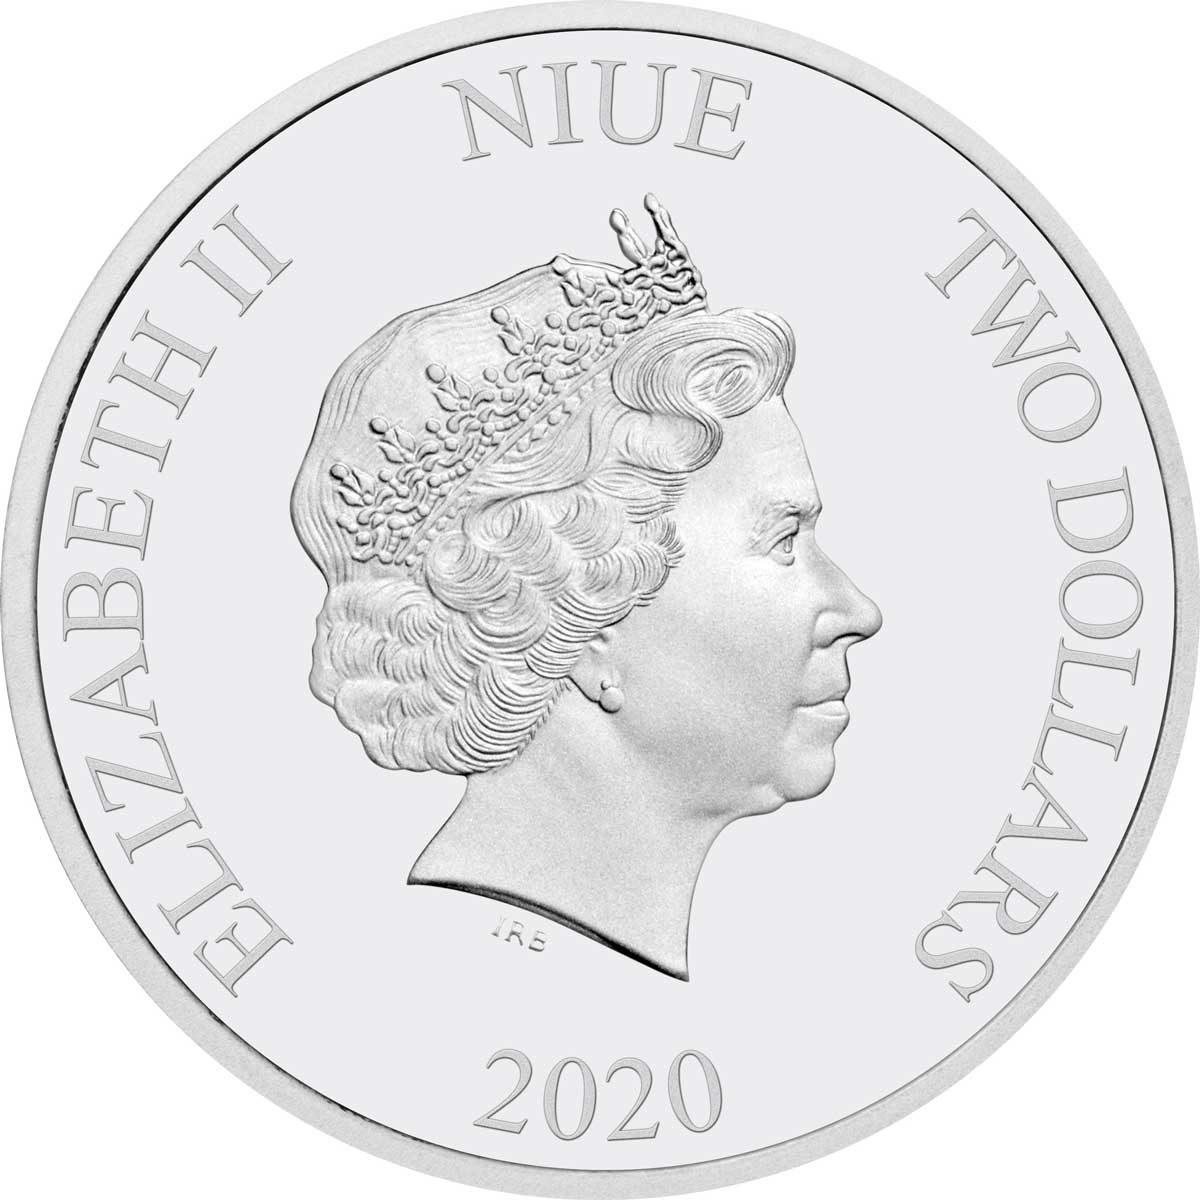 BATMAN 1966 BATMAN /& PENGUIN 2020 Niue 2x 1oz silver coin